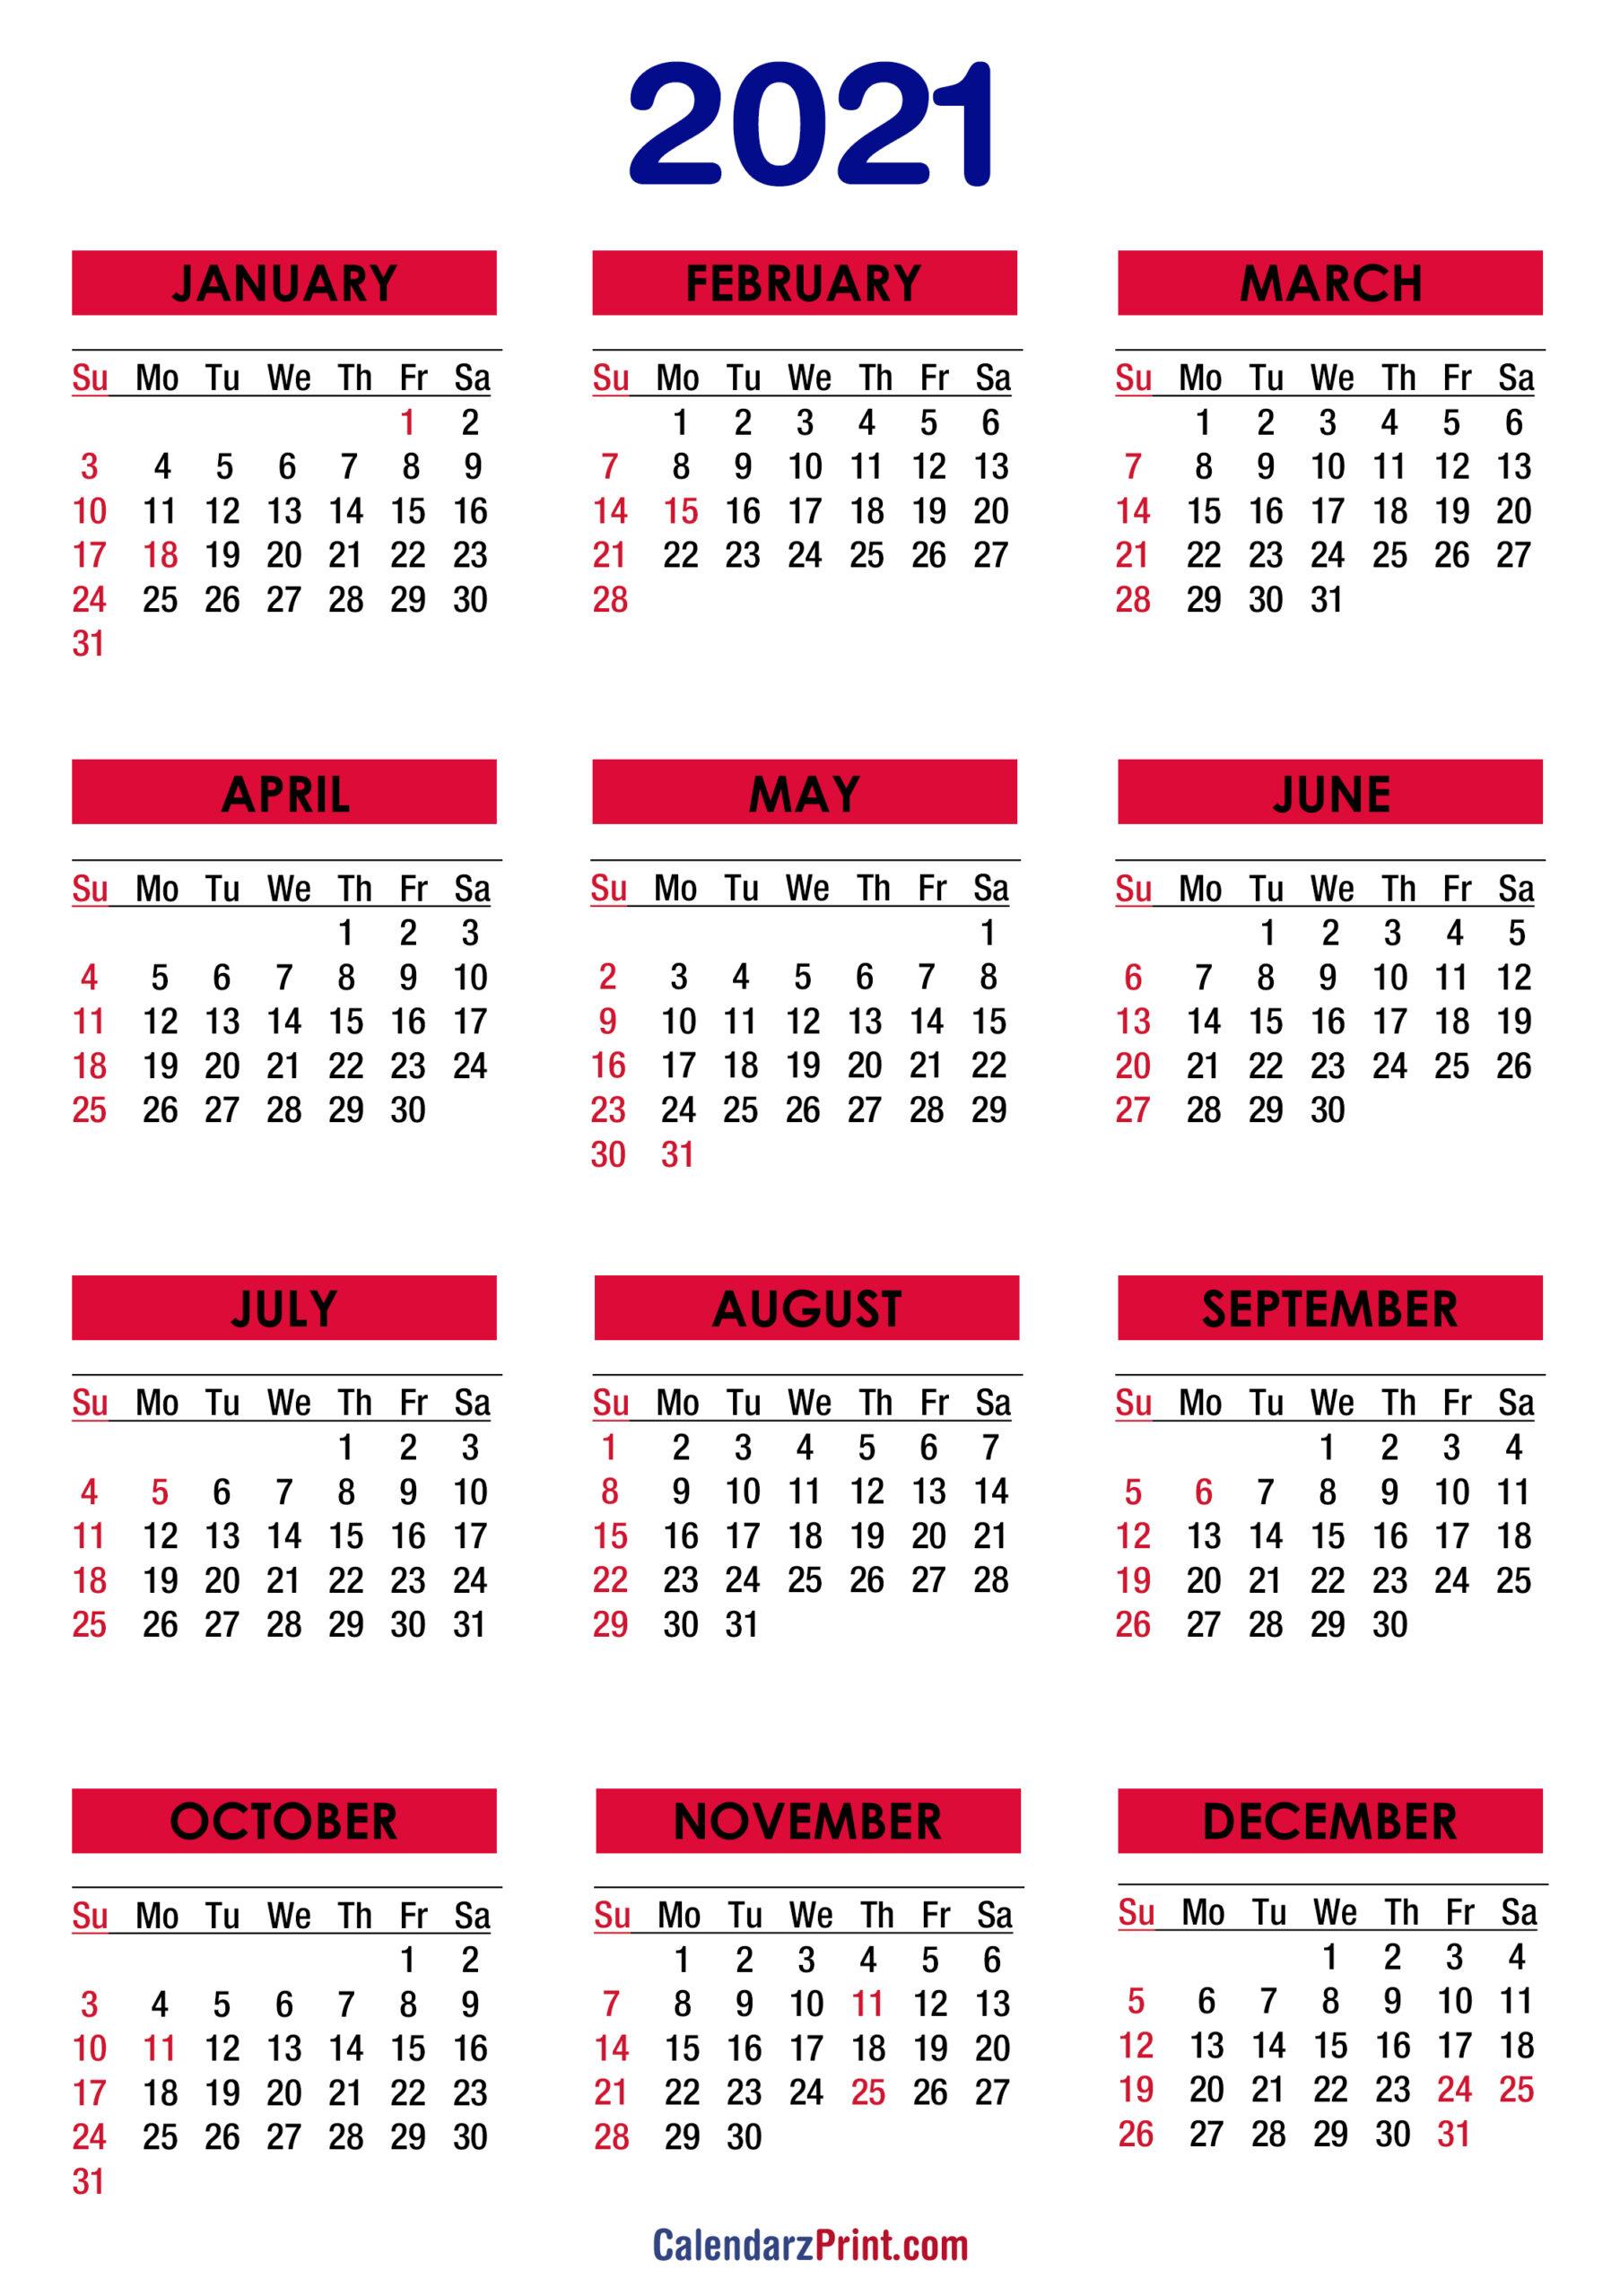 2021 Yearly Calendar Printable Free Pdf